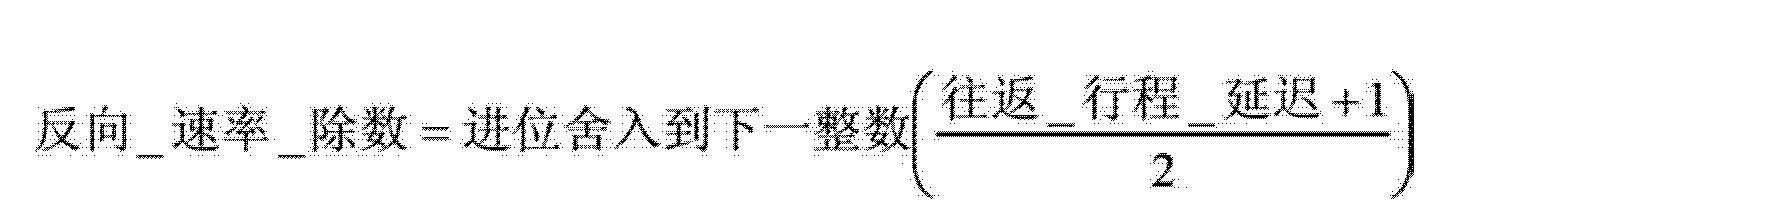 Figure CN102801595AD00811